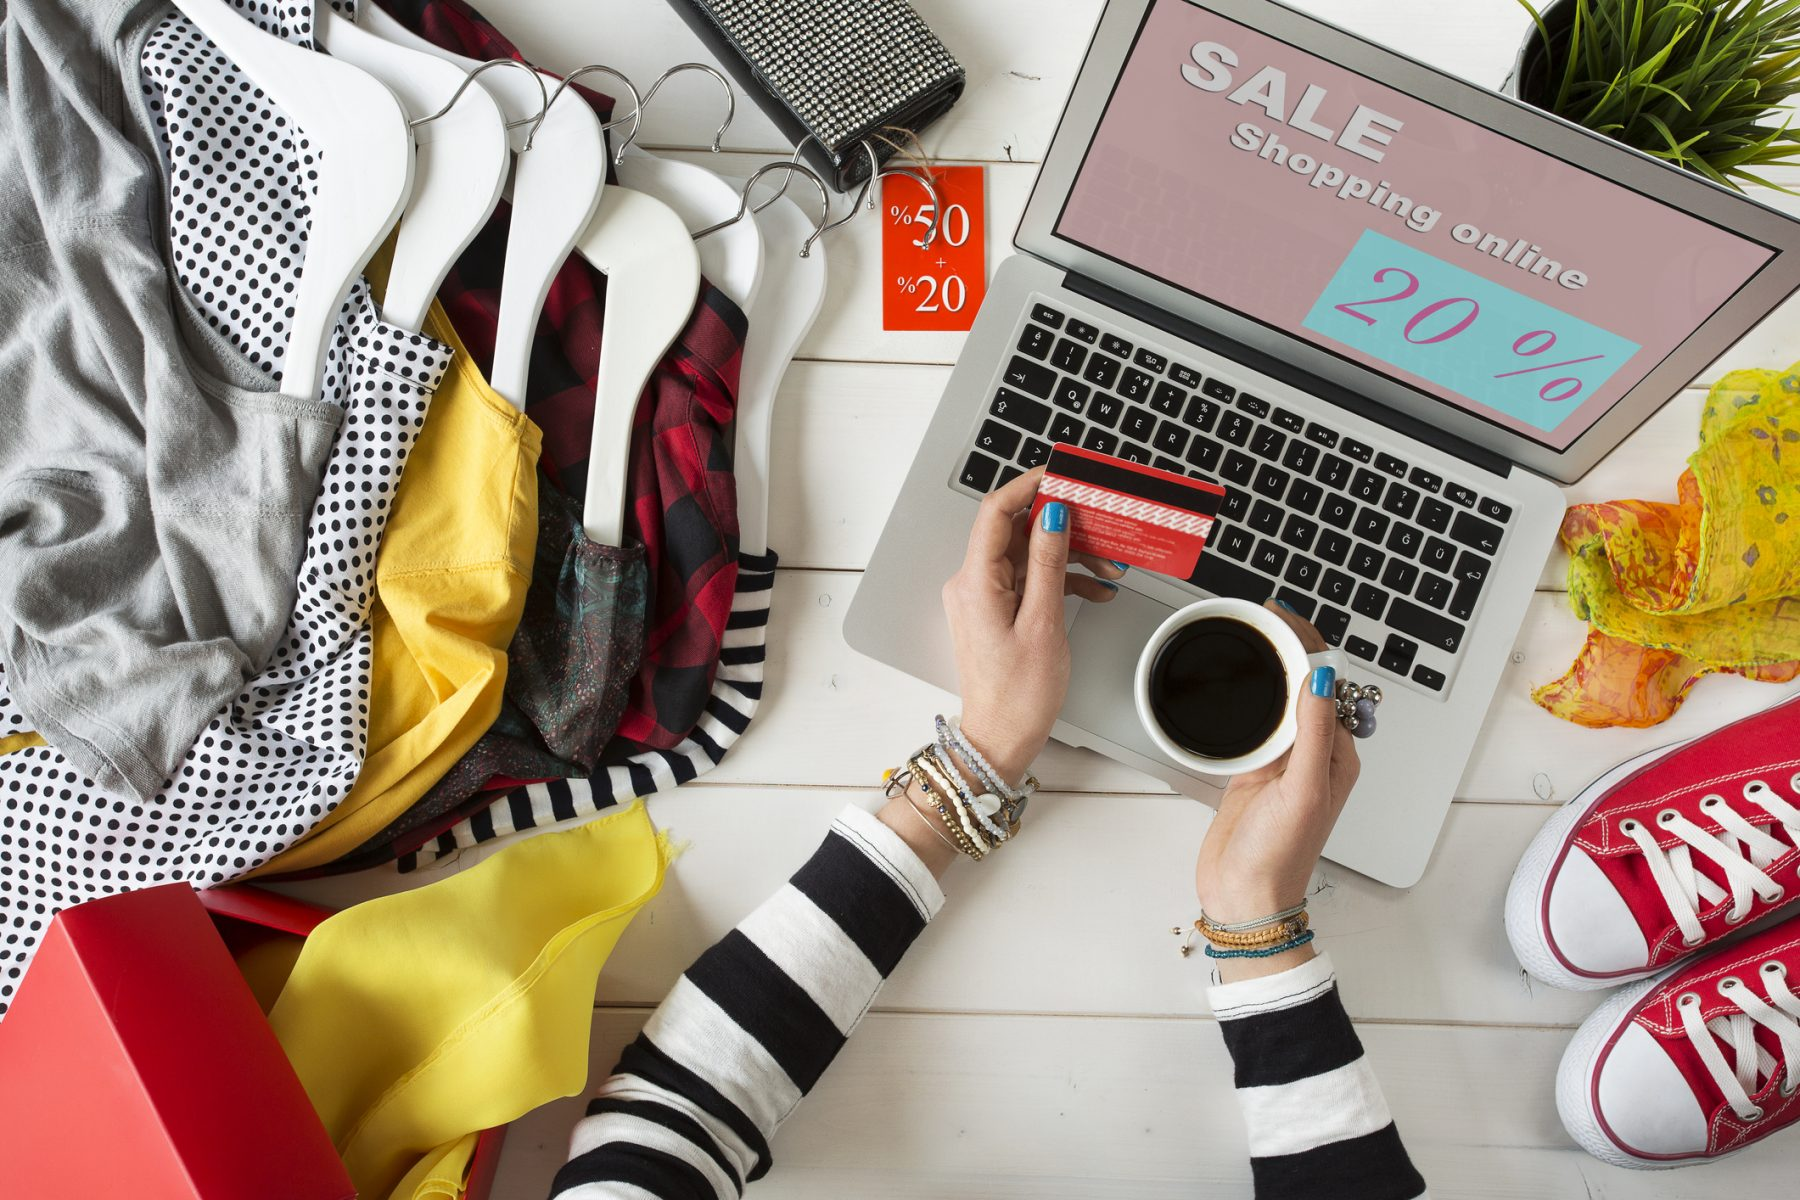 Black Friday: Πότε πέφτει και  τι πρέπει να προσέξουν οι καταναλωτές